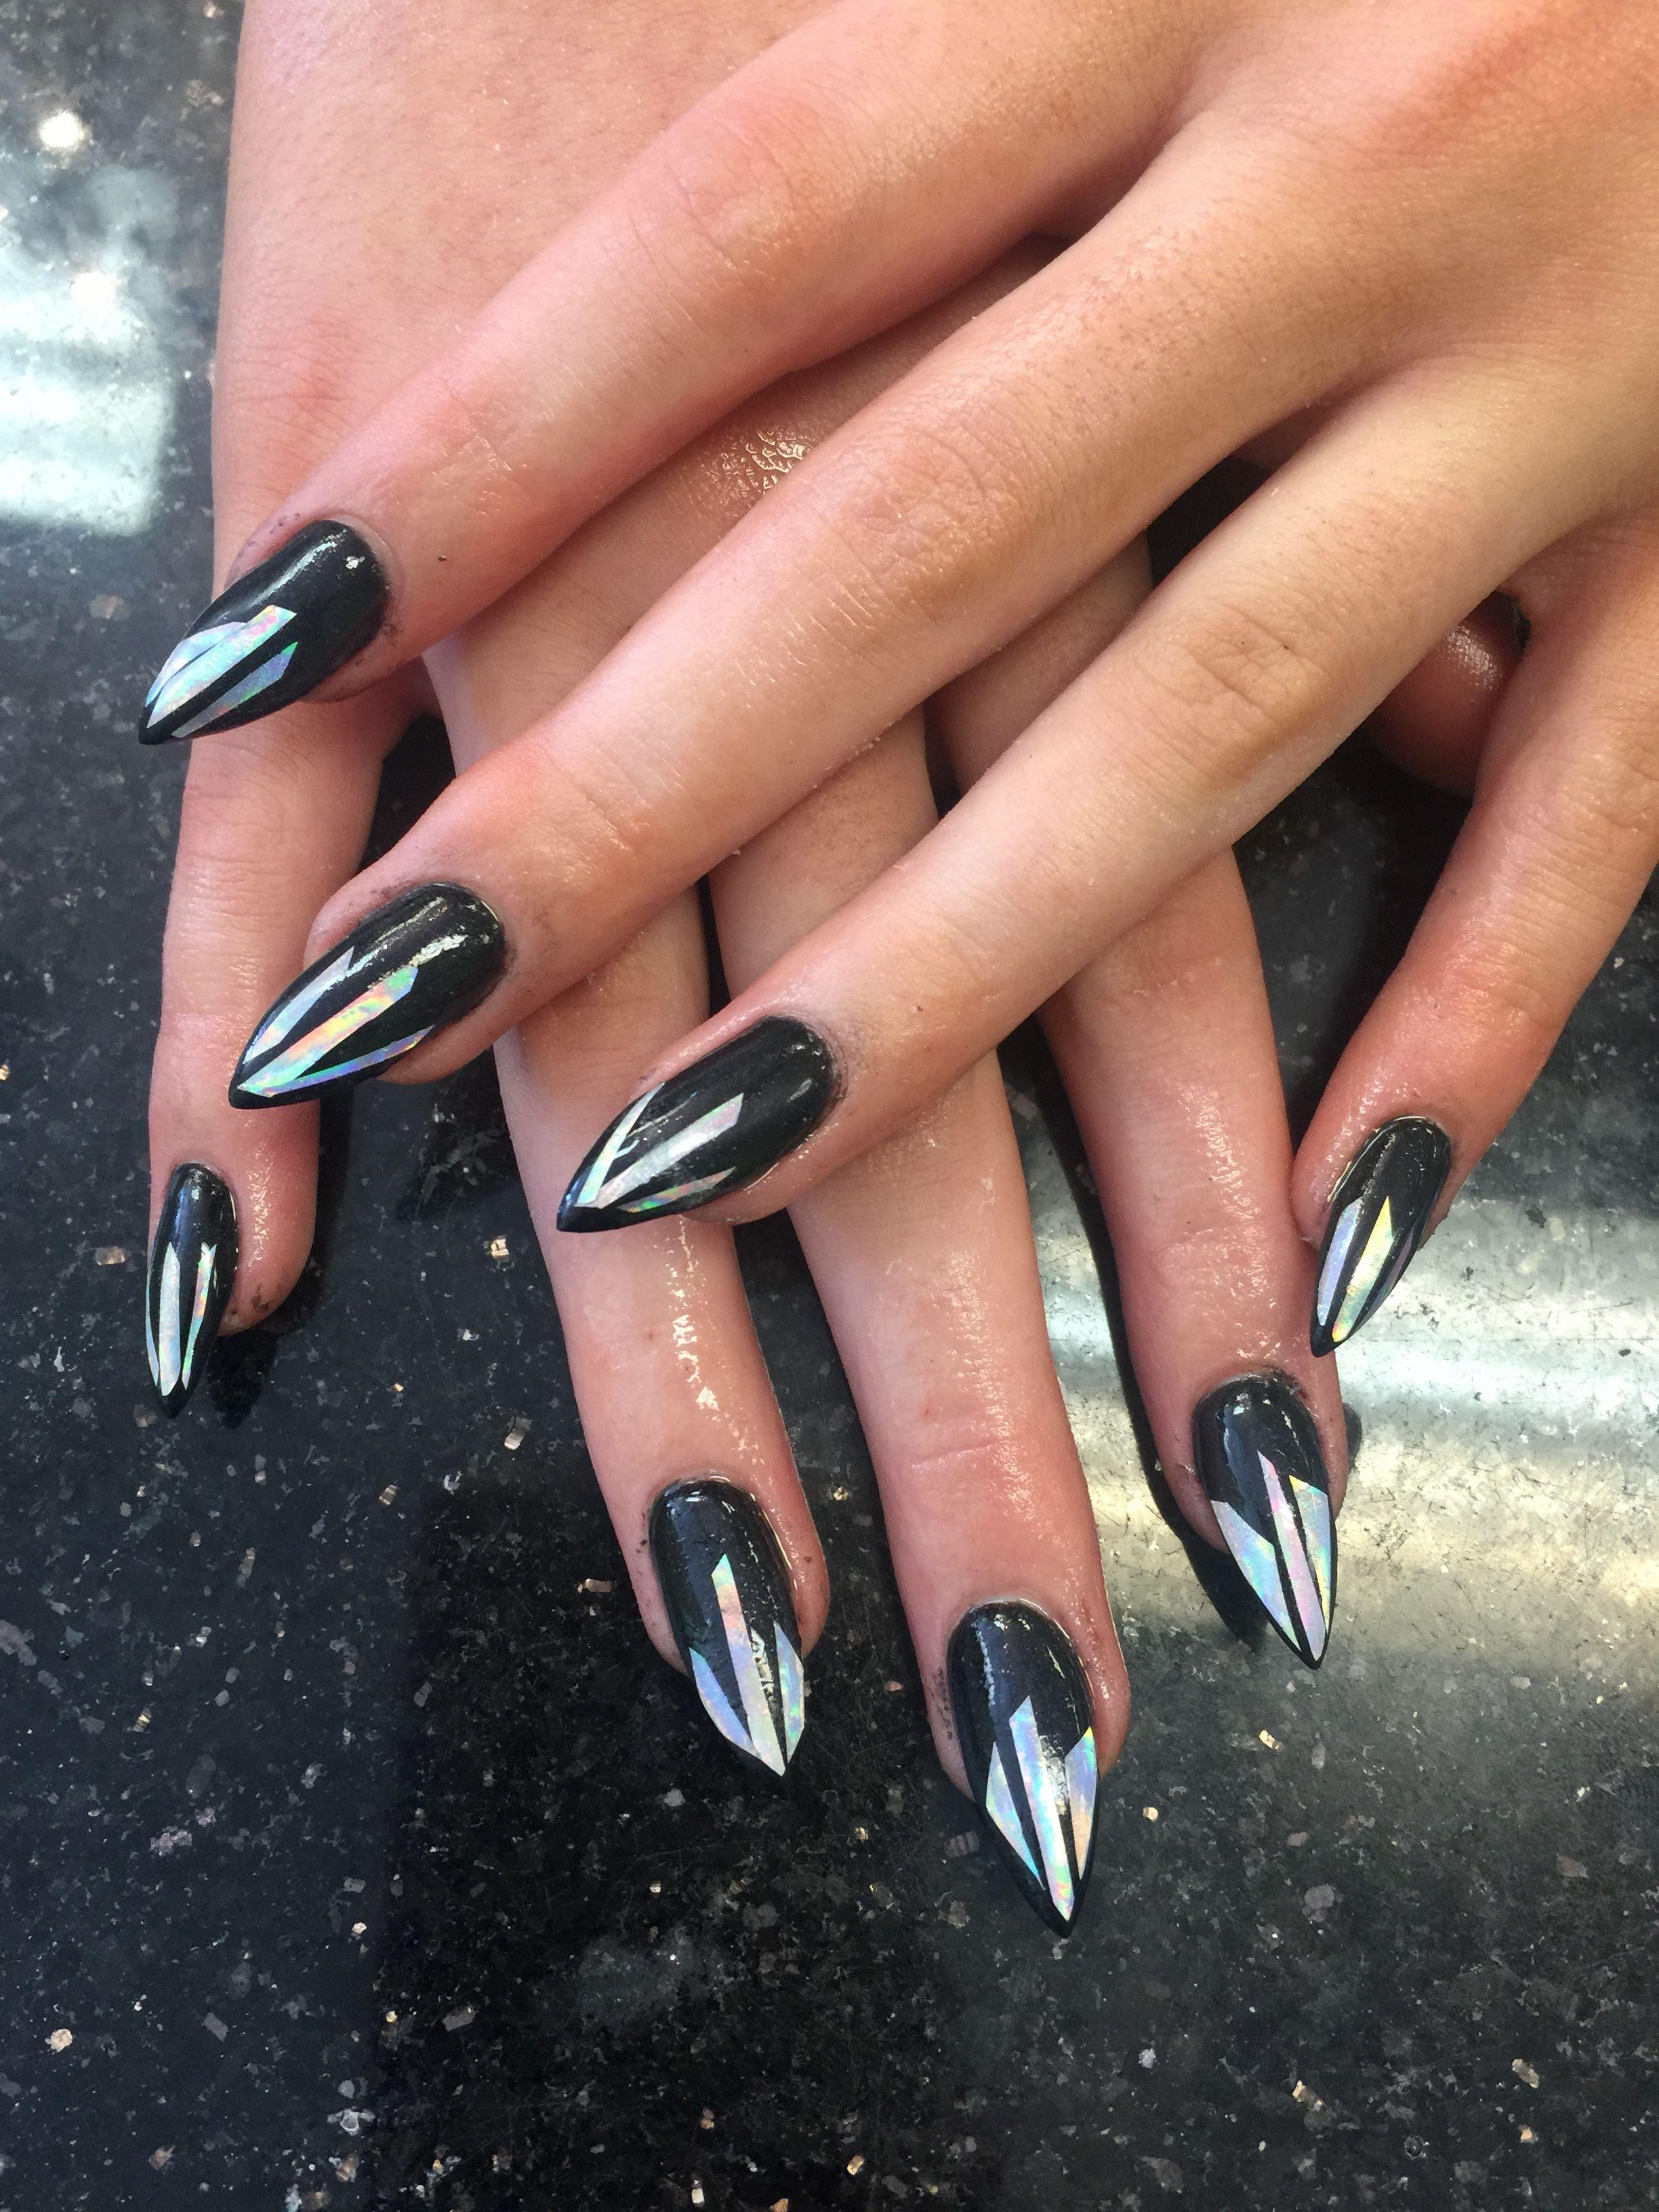 Black colors nails designs | Acrylic nail | Pinterest | Color nails ...